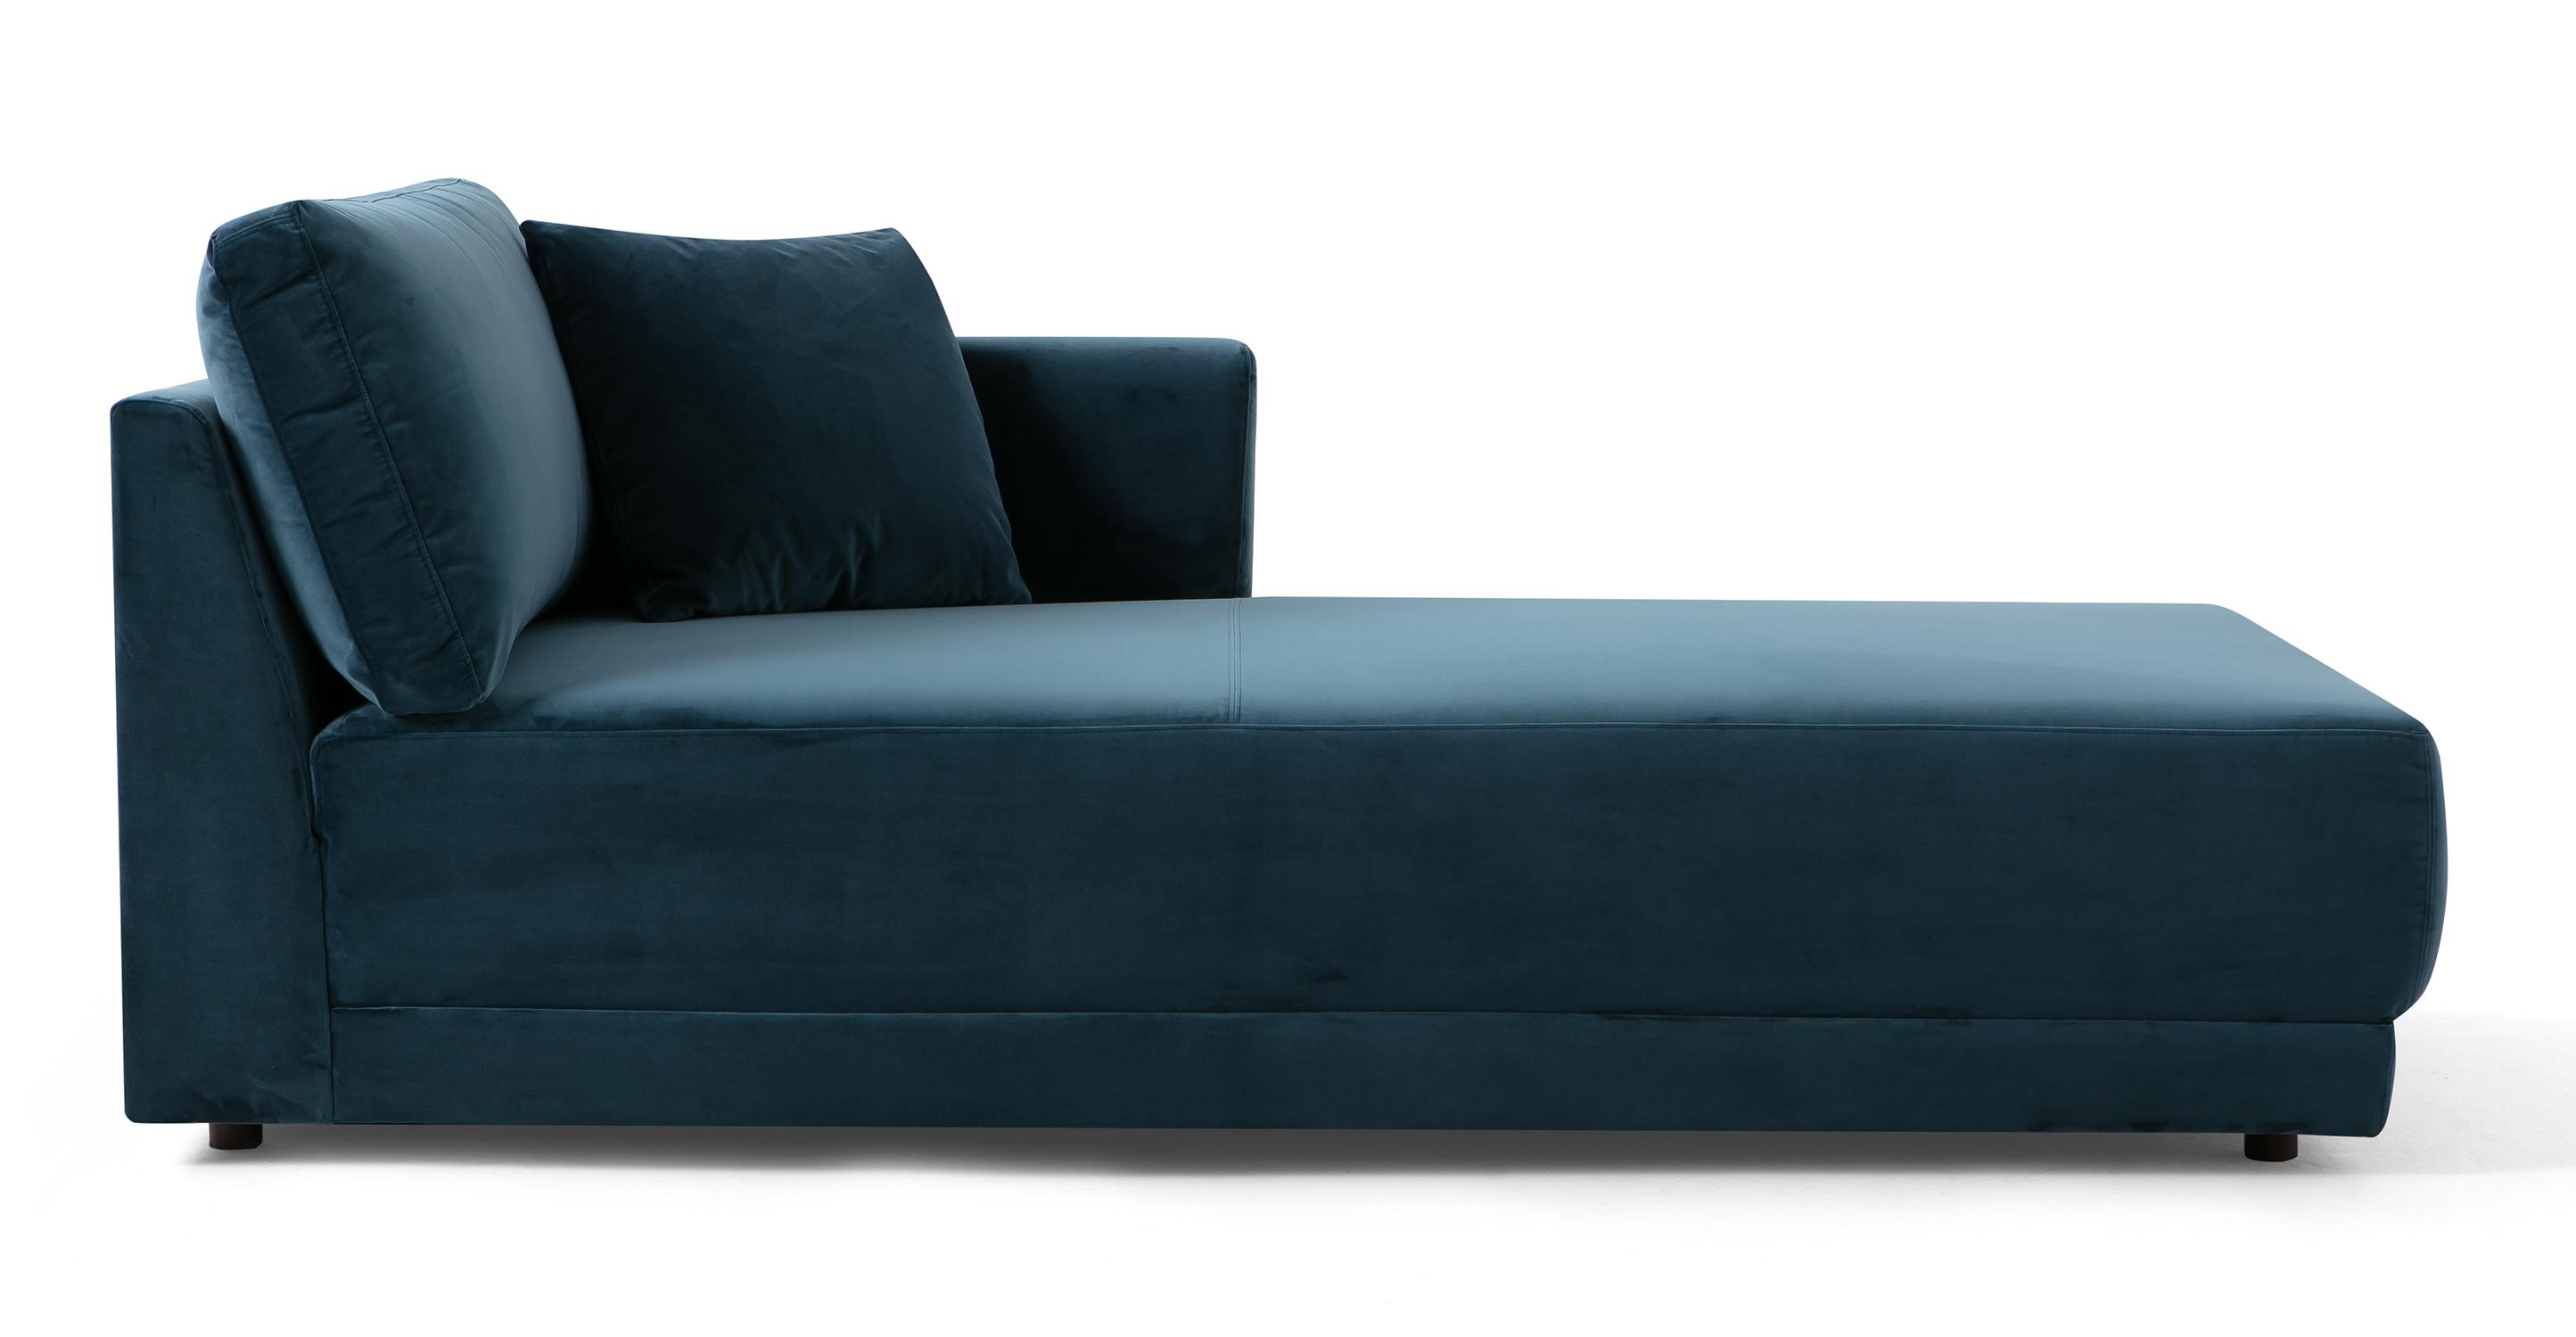 "Domus 39"" Right Chaise Fabric Sofa, Petrol Velvet"